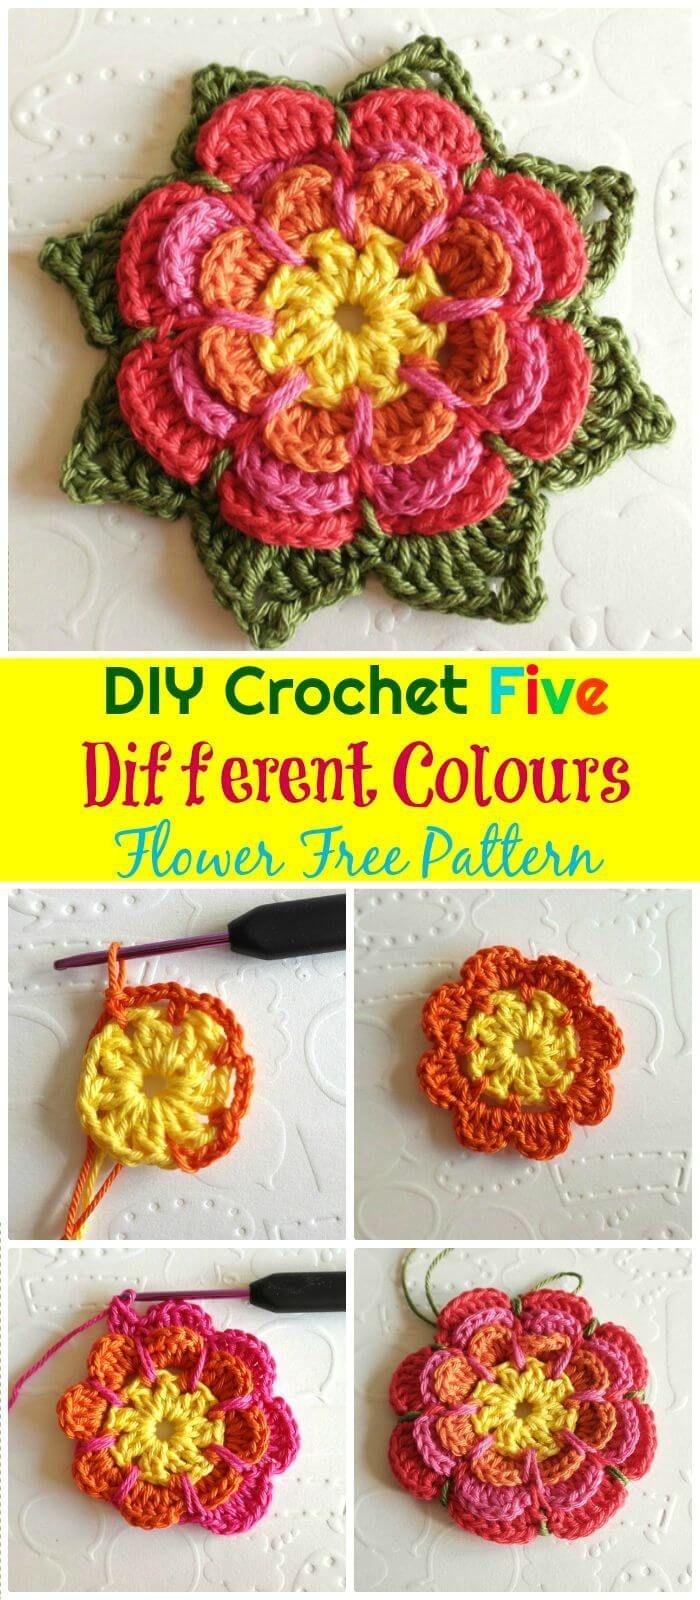 Crochet Flowers 90 Free Crochet Flower Patterns Linda